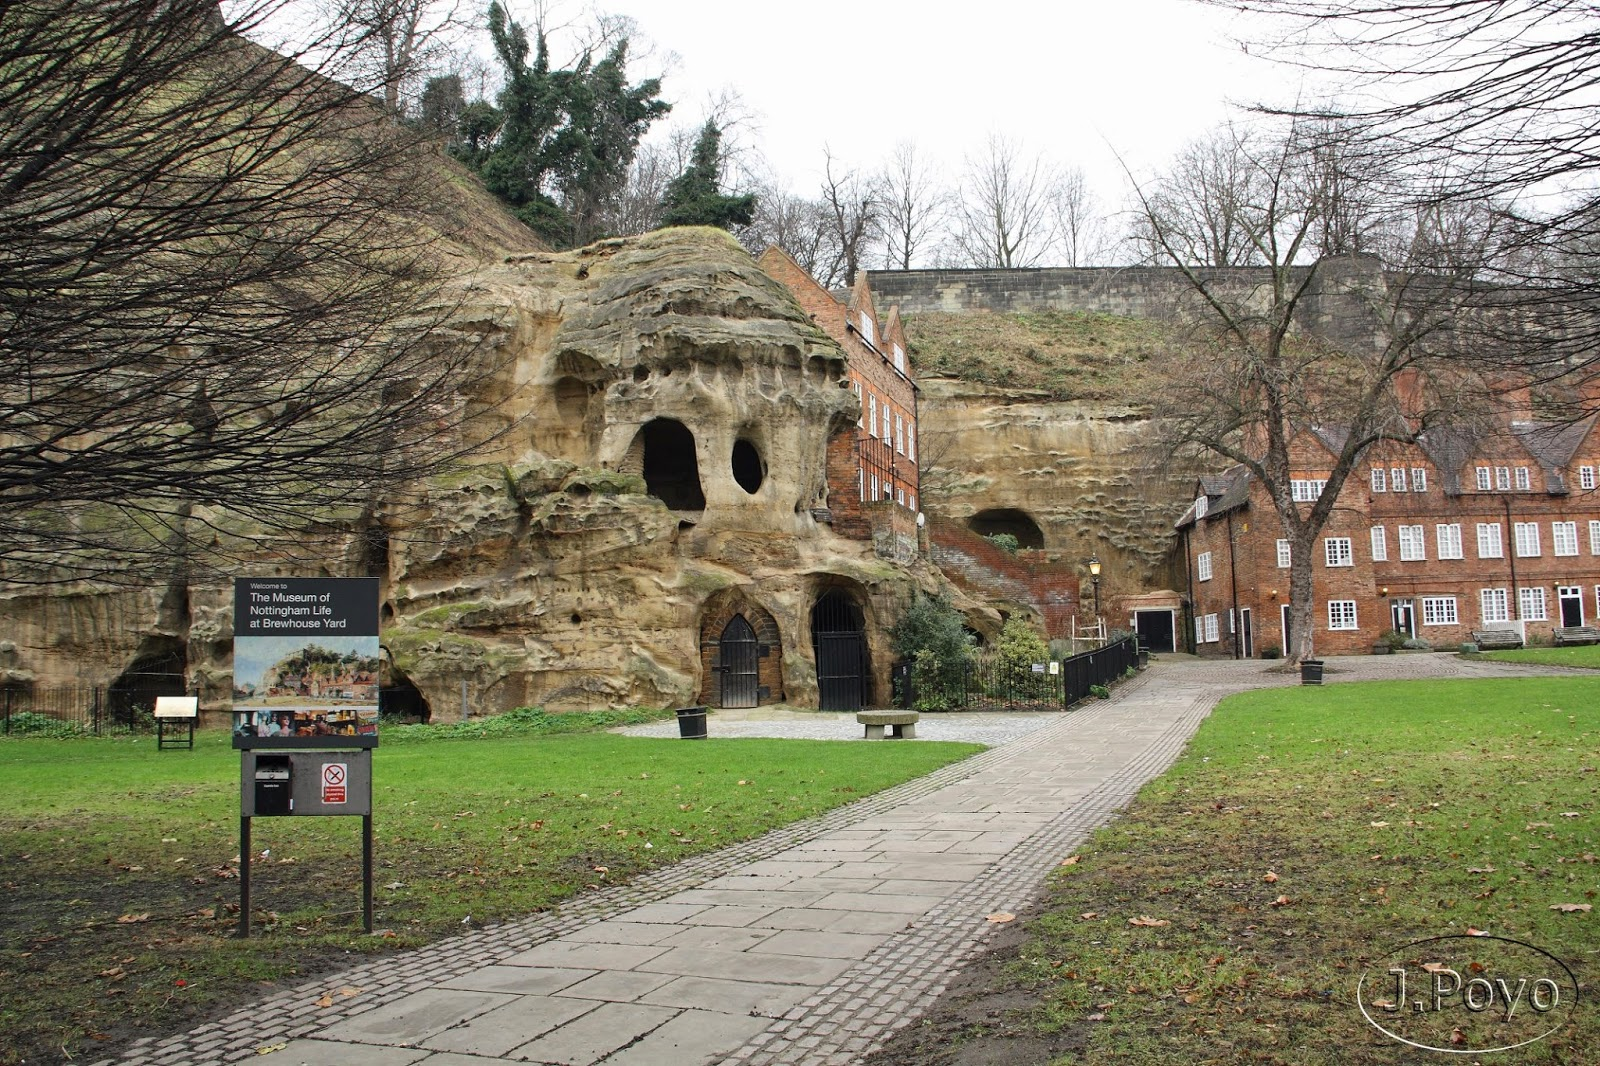 Ye Olde Trip To Jerusalem, Nottingham